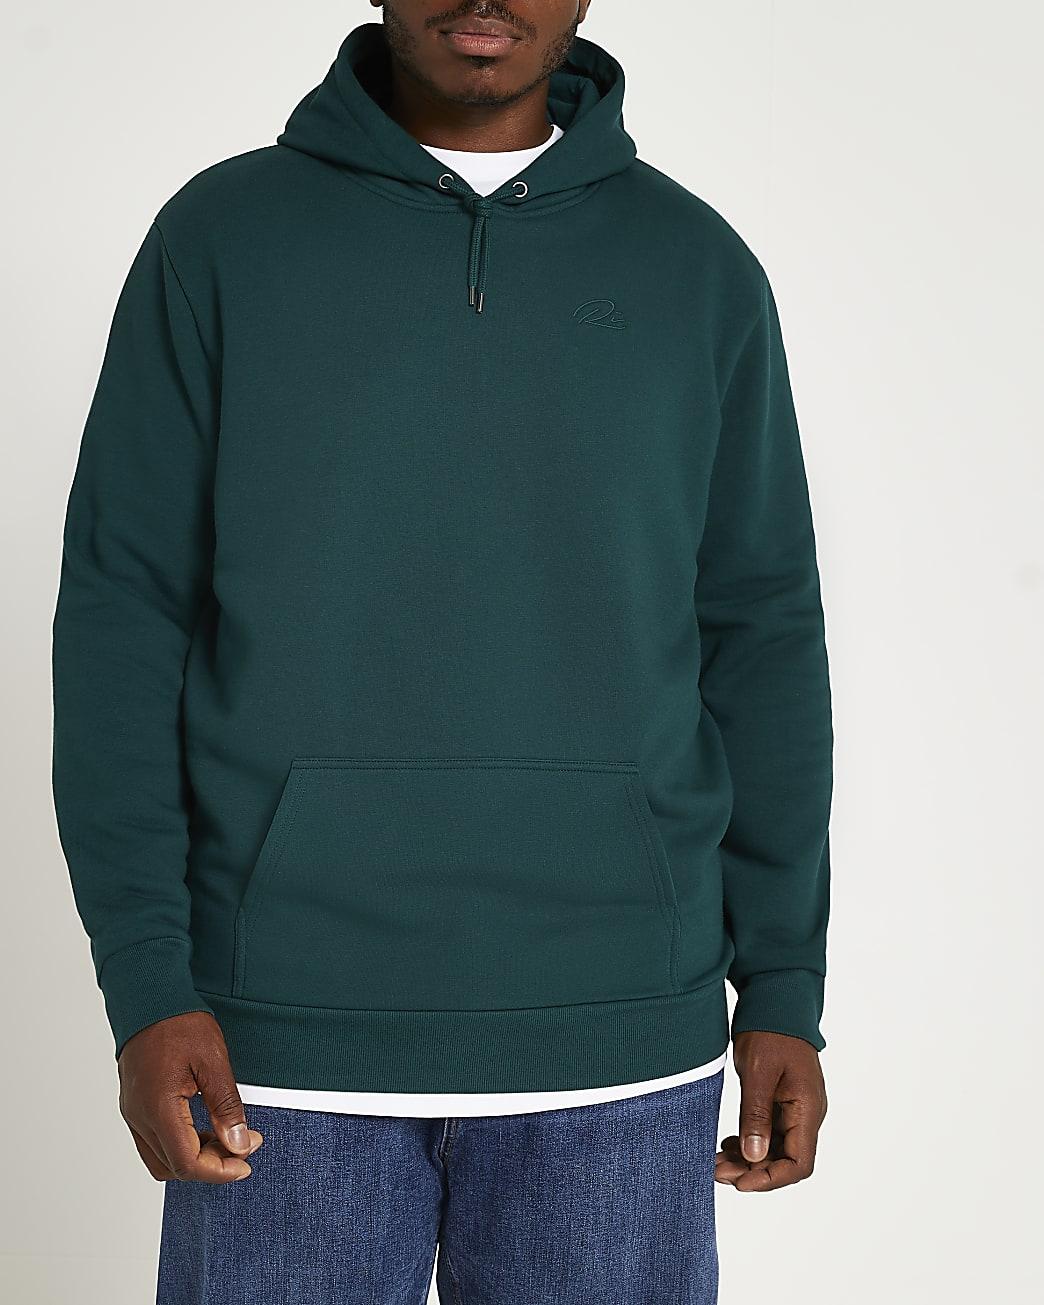 Big & tall green RI hoodie